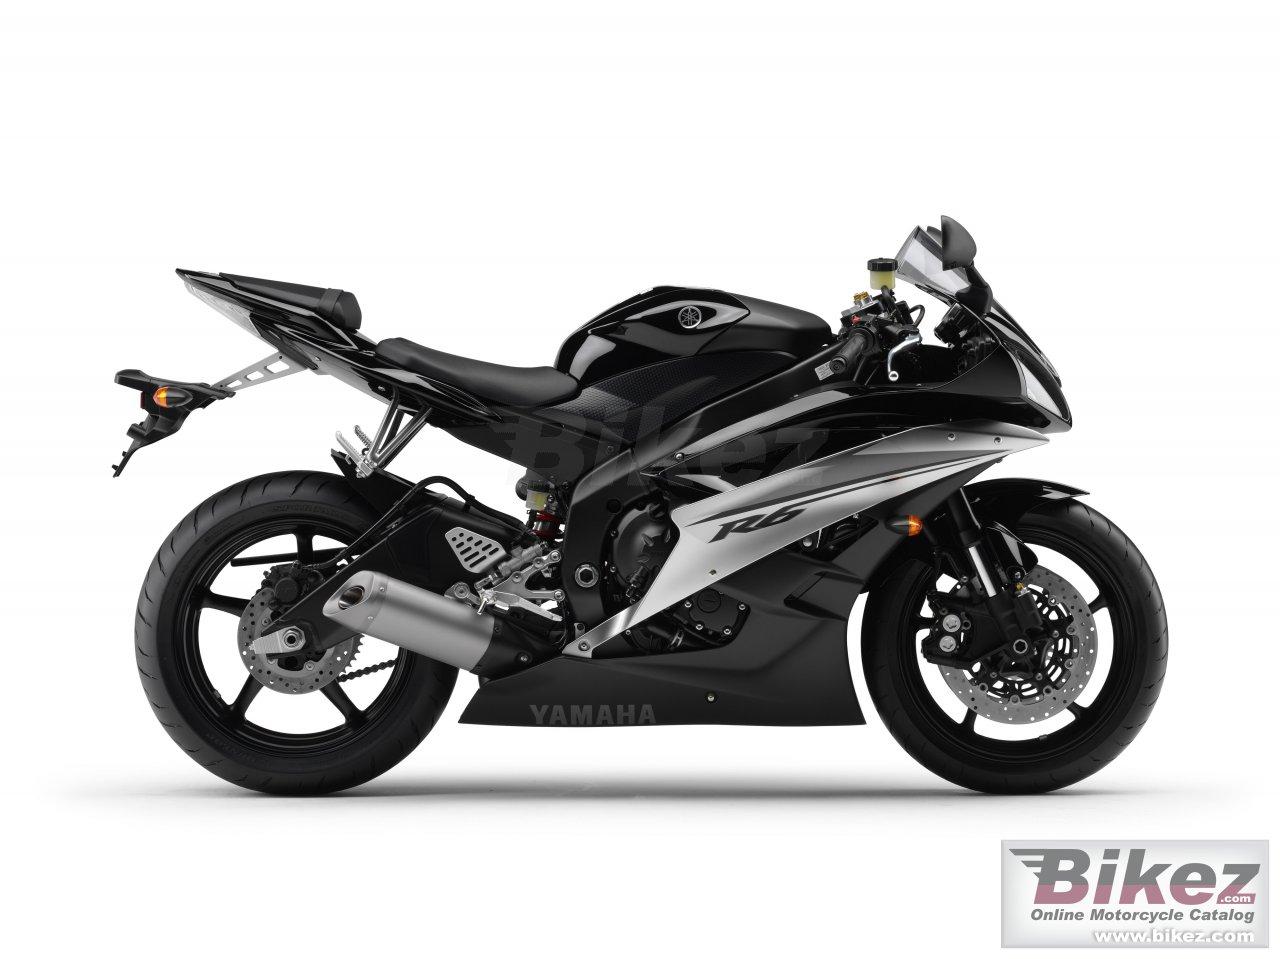 Мотоцикл yamaha yzf-r6 `14